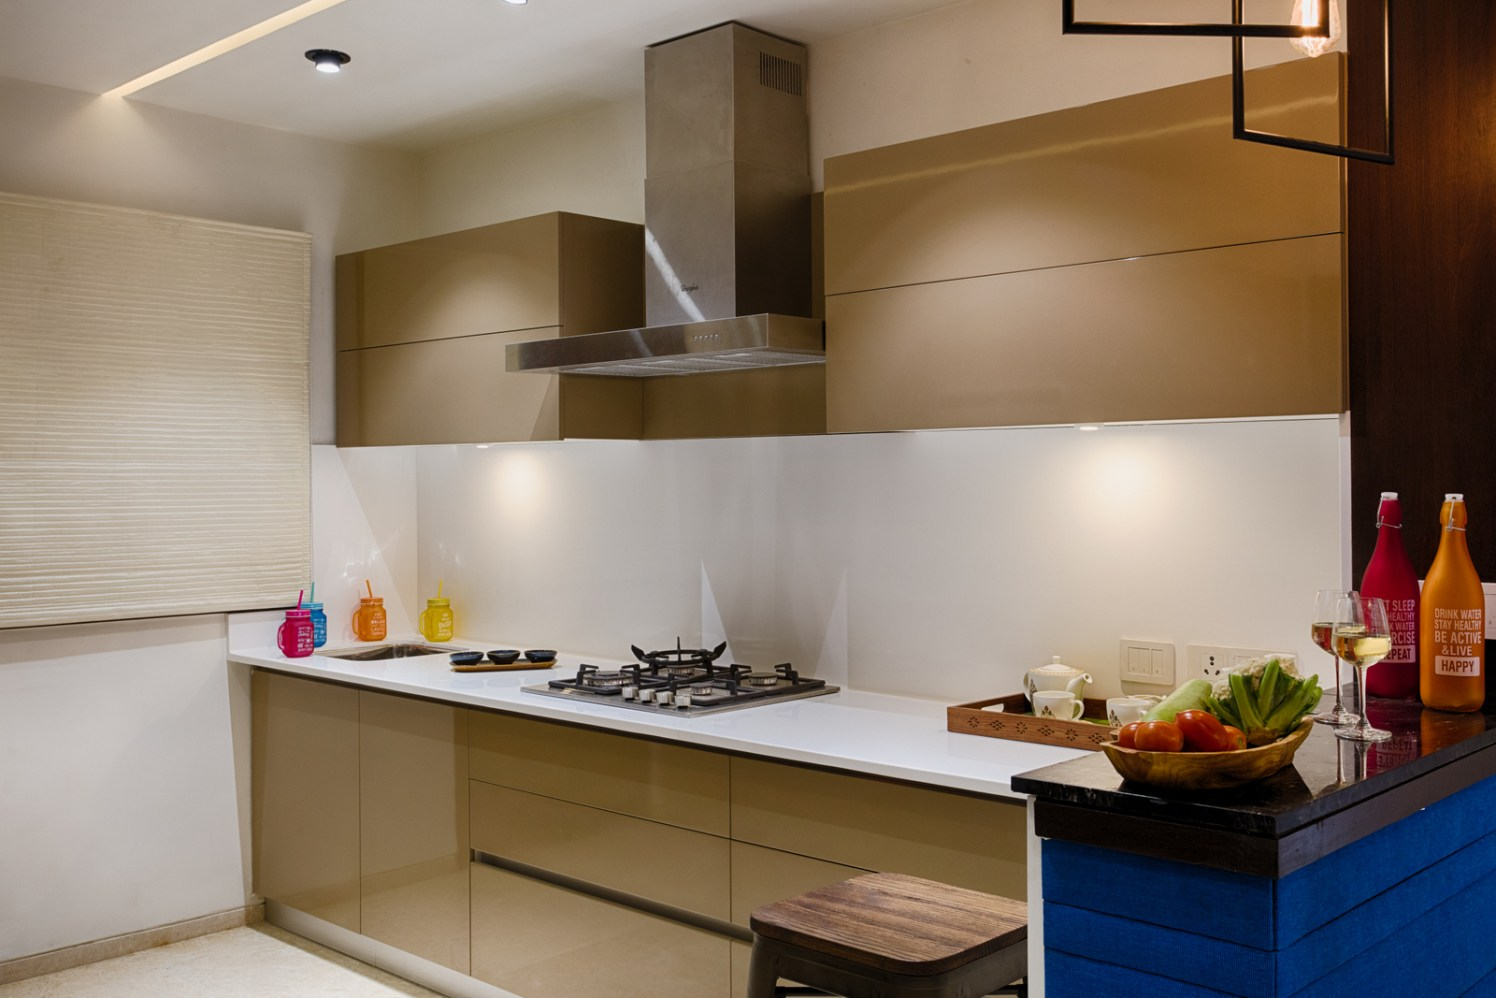 Beige Cabinets And Modern Interior Of Parallel Kitchen